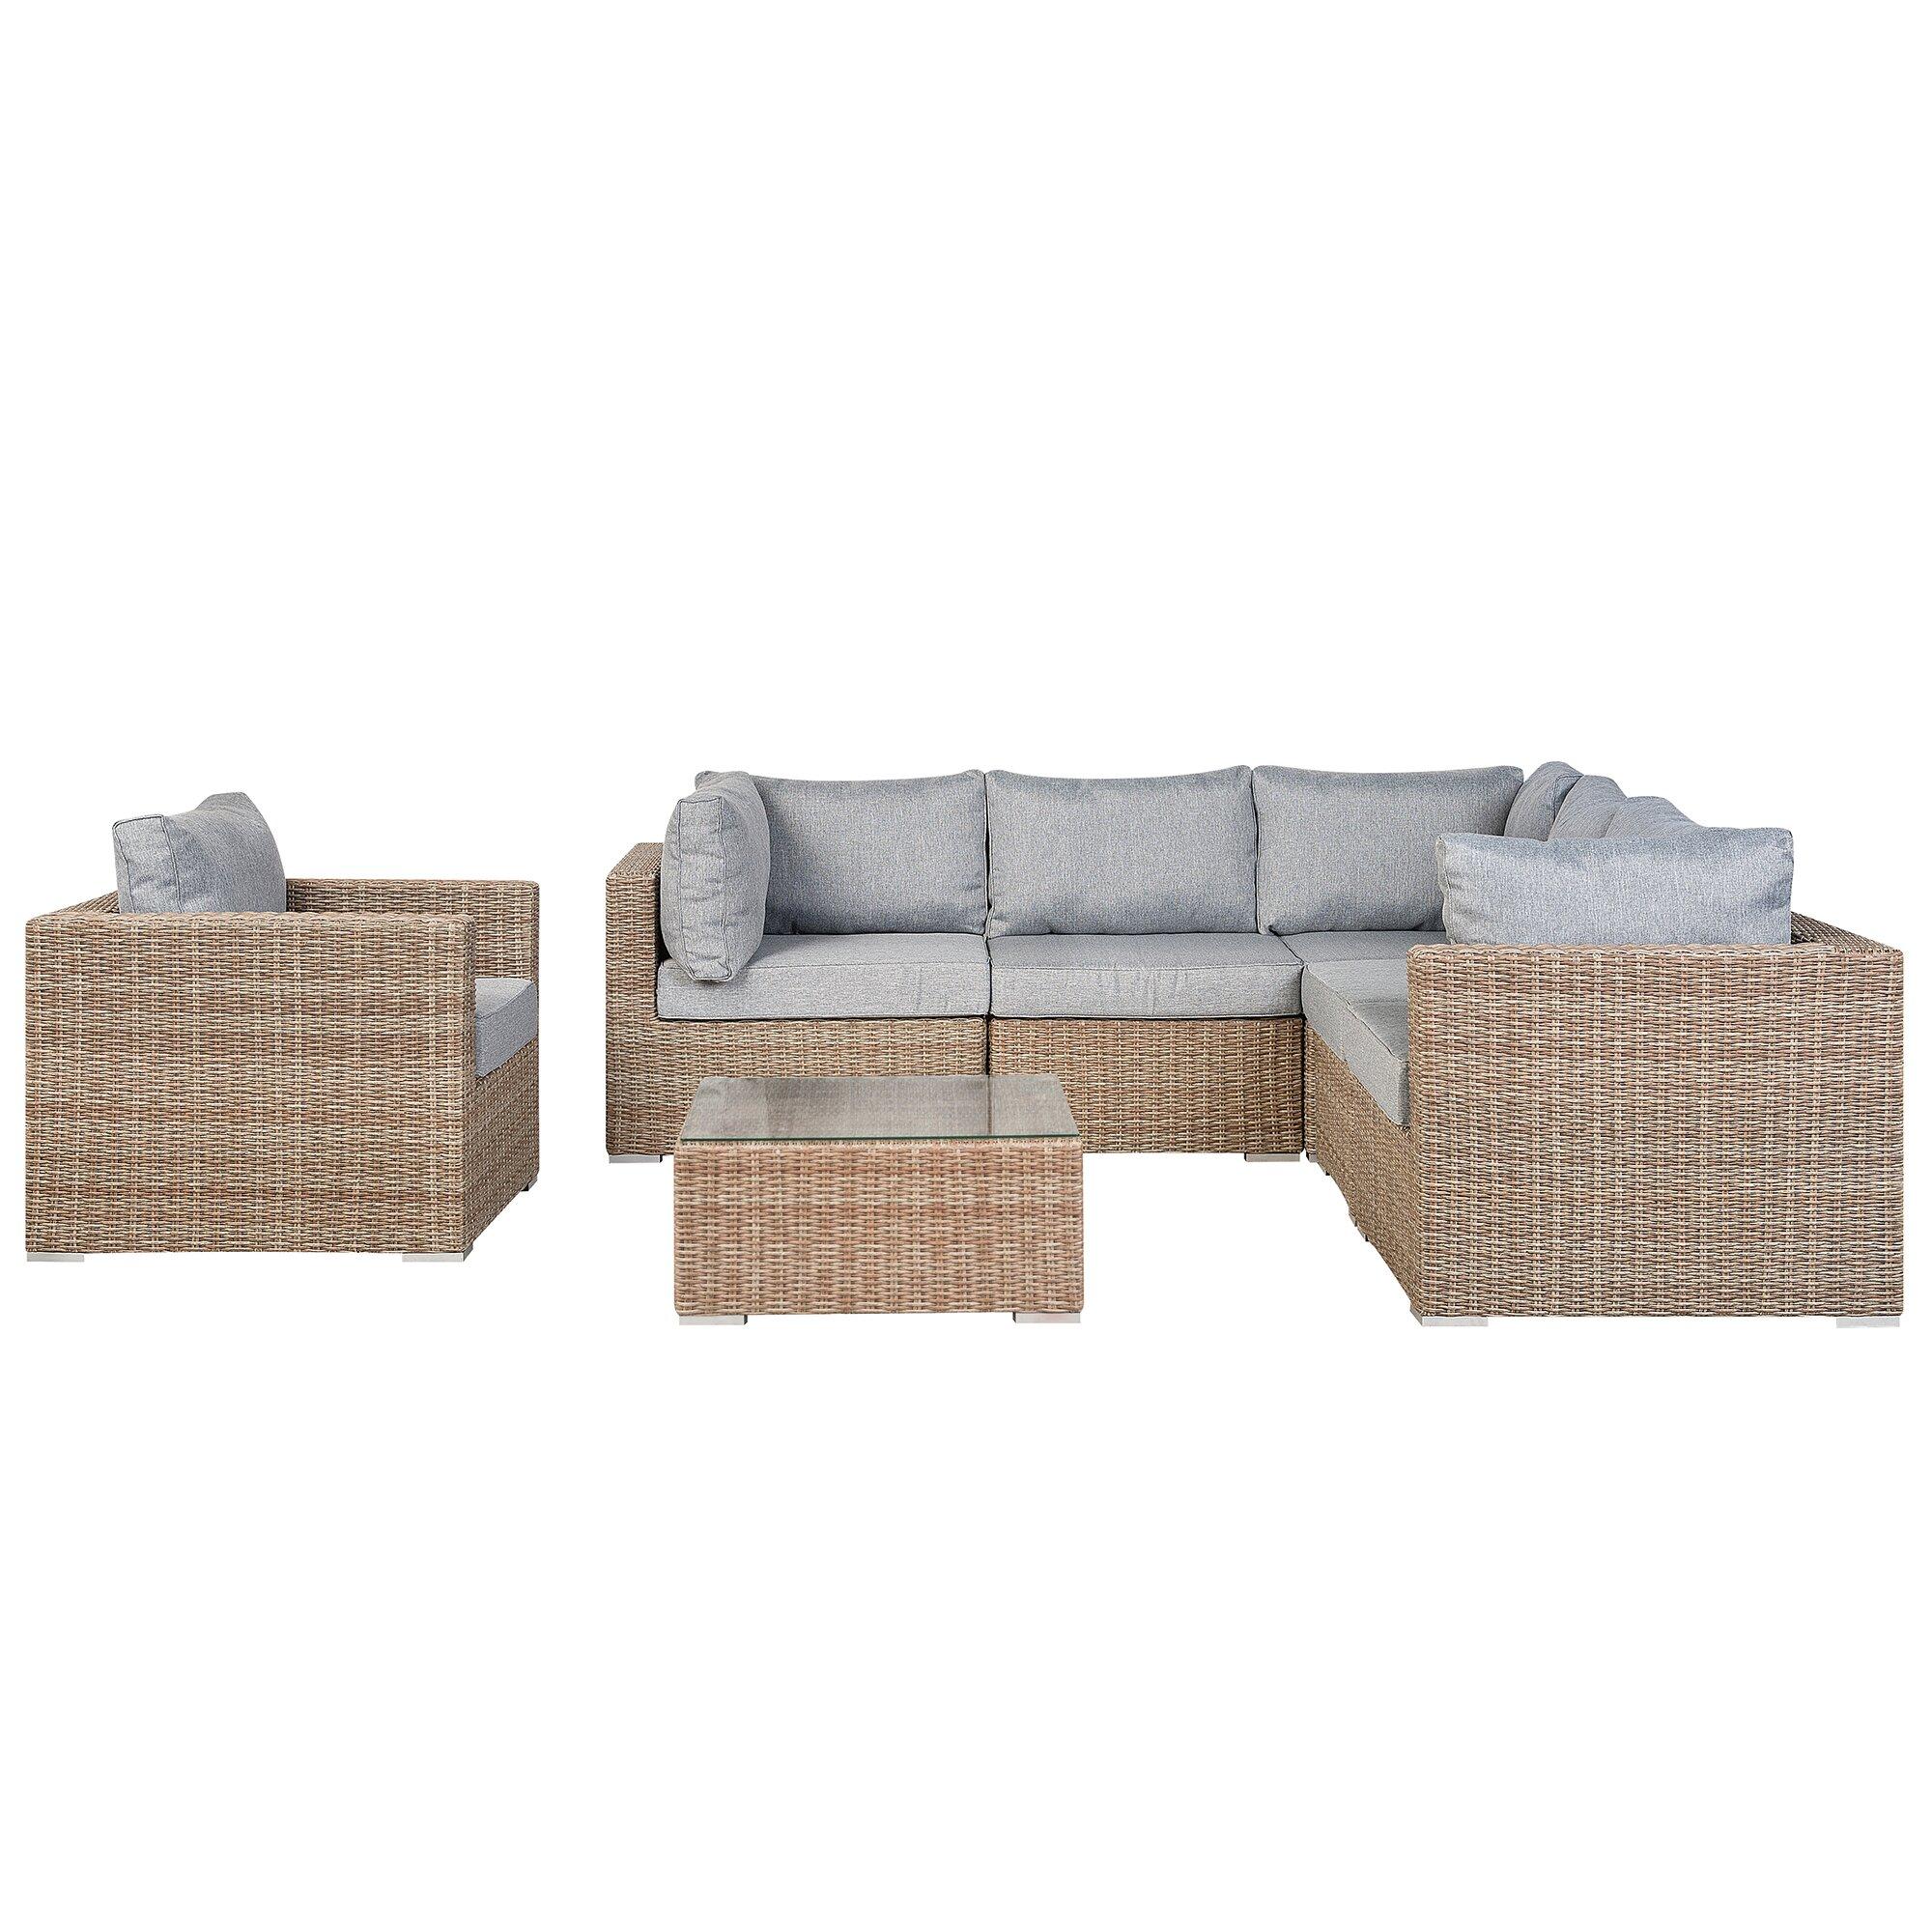 Pleasant Wynnfield 6 Seater Rattan Sofa Set Squirreltailoven Fun Painted Chair Ideas Images Squirreltailovenorg